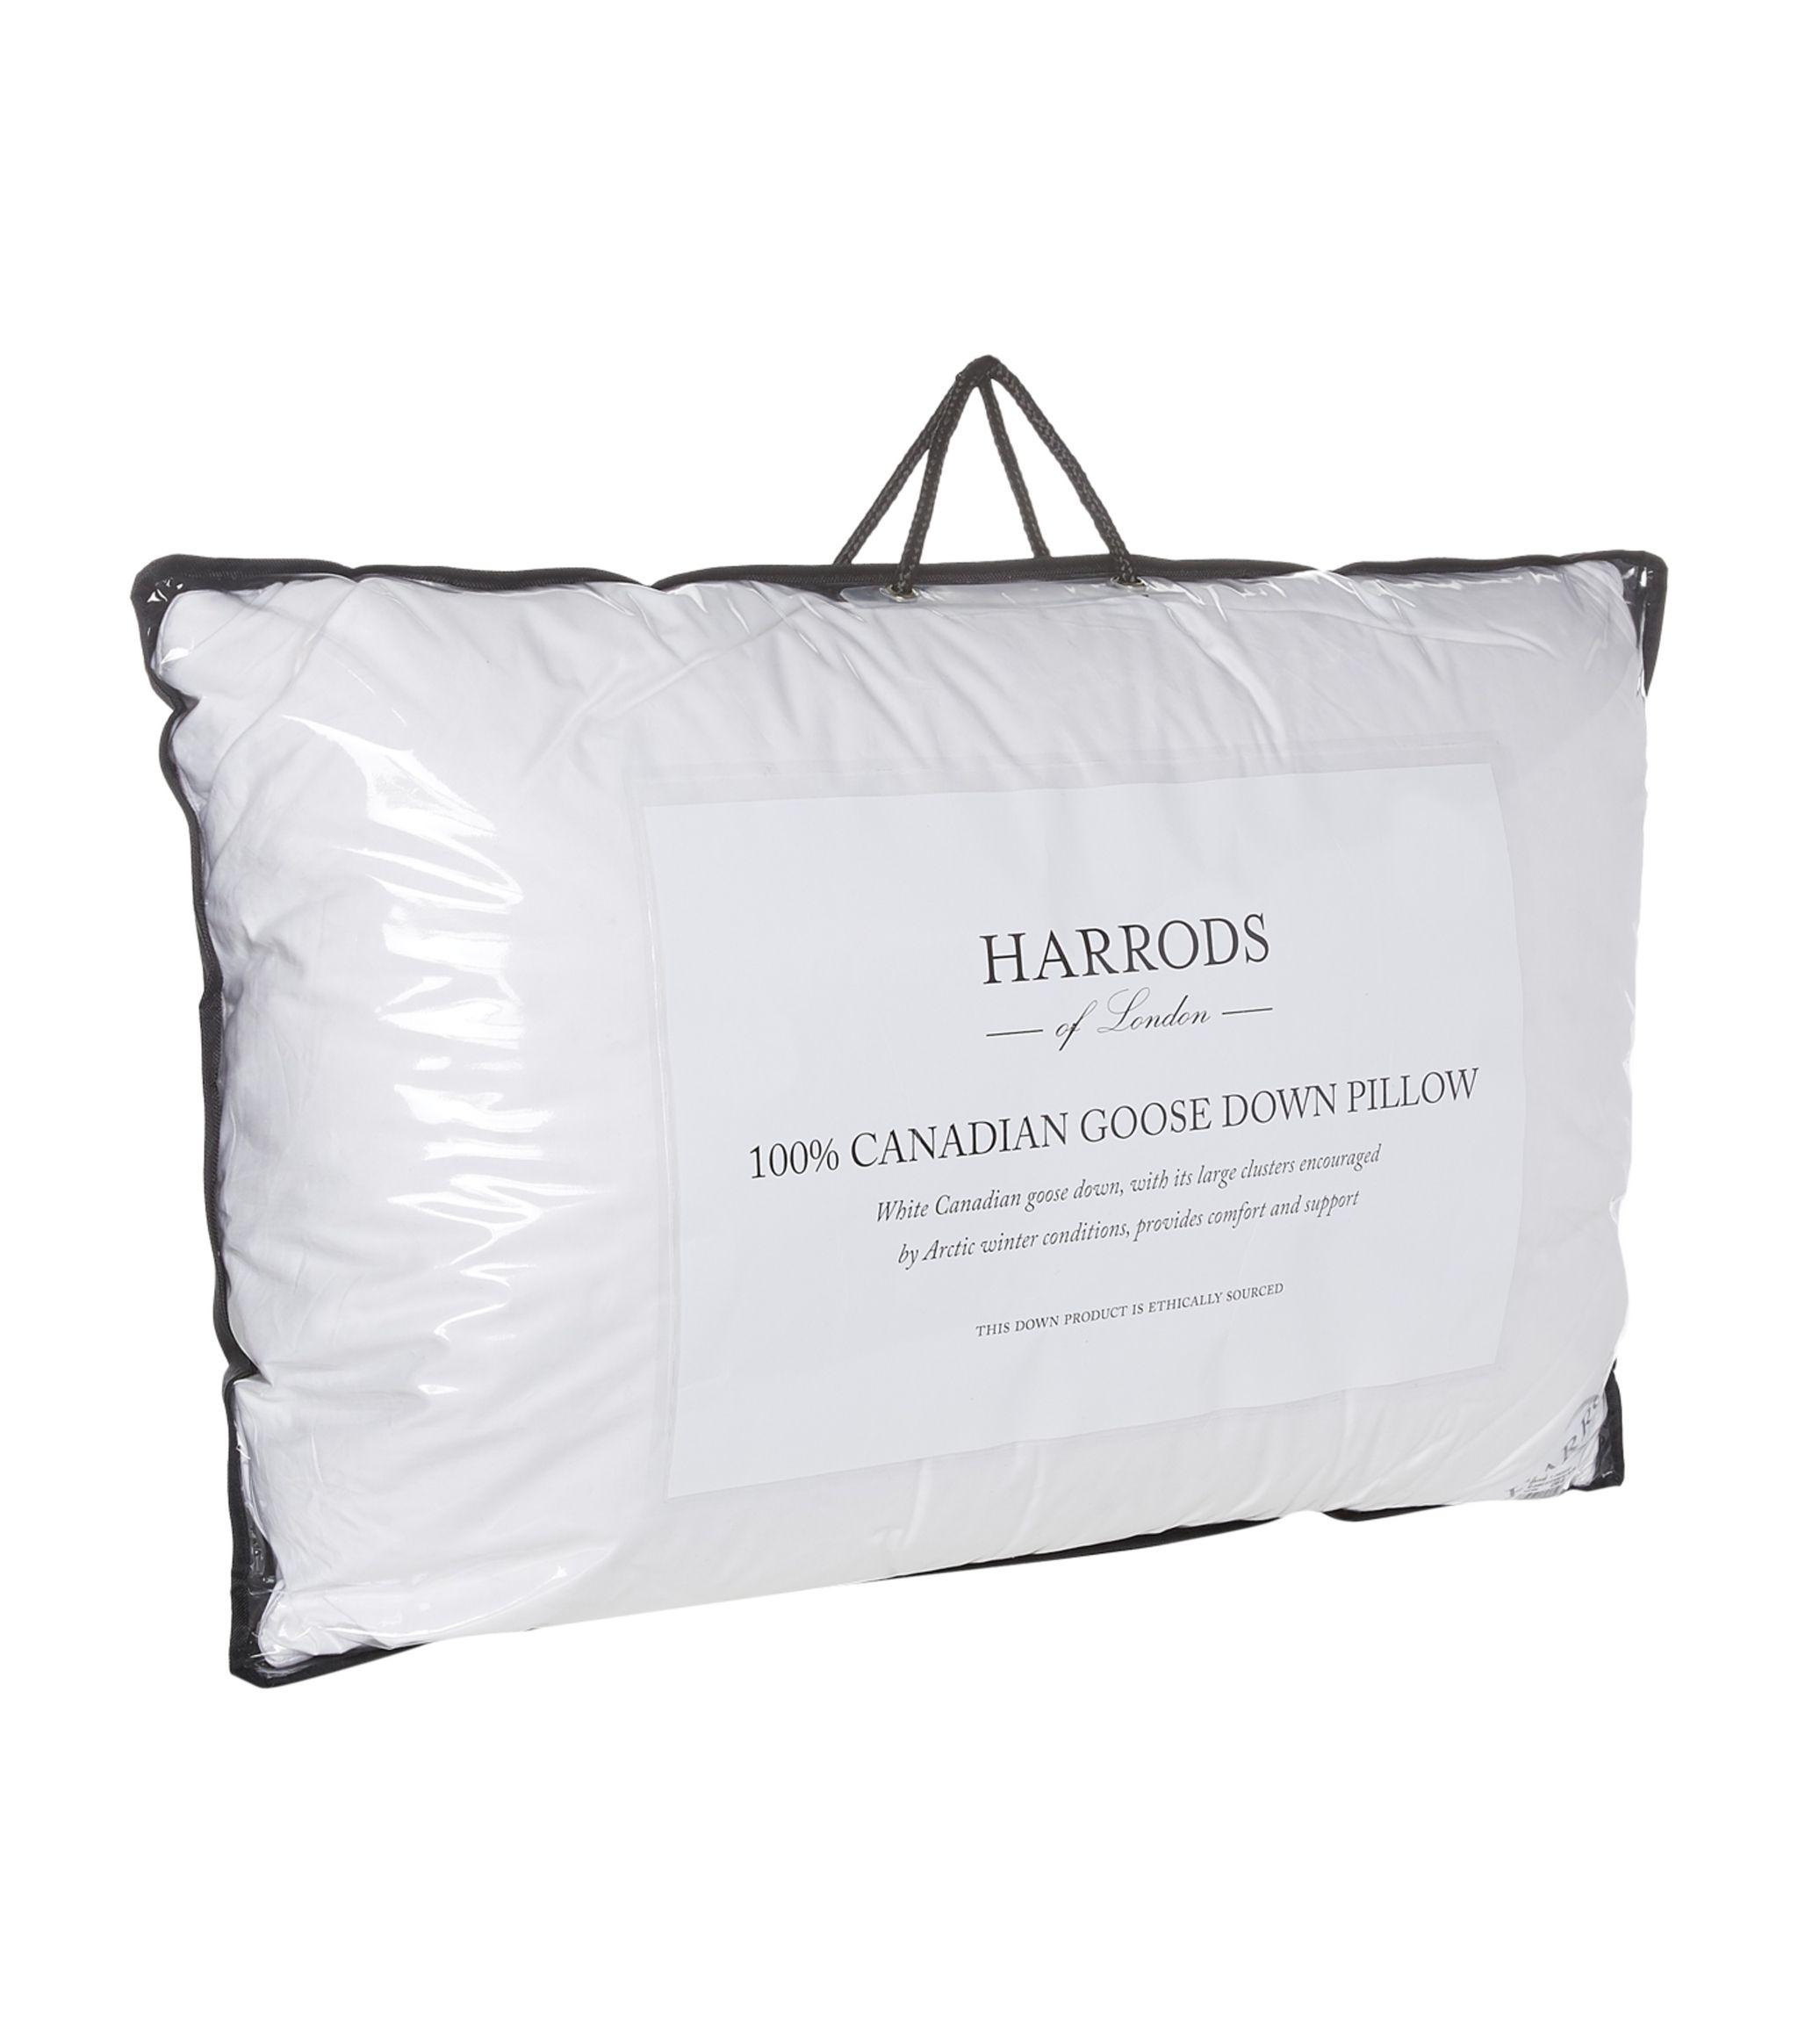 harrods of london white medium firm 100 canadian goose down pillow harrods uk